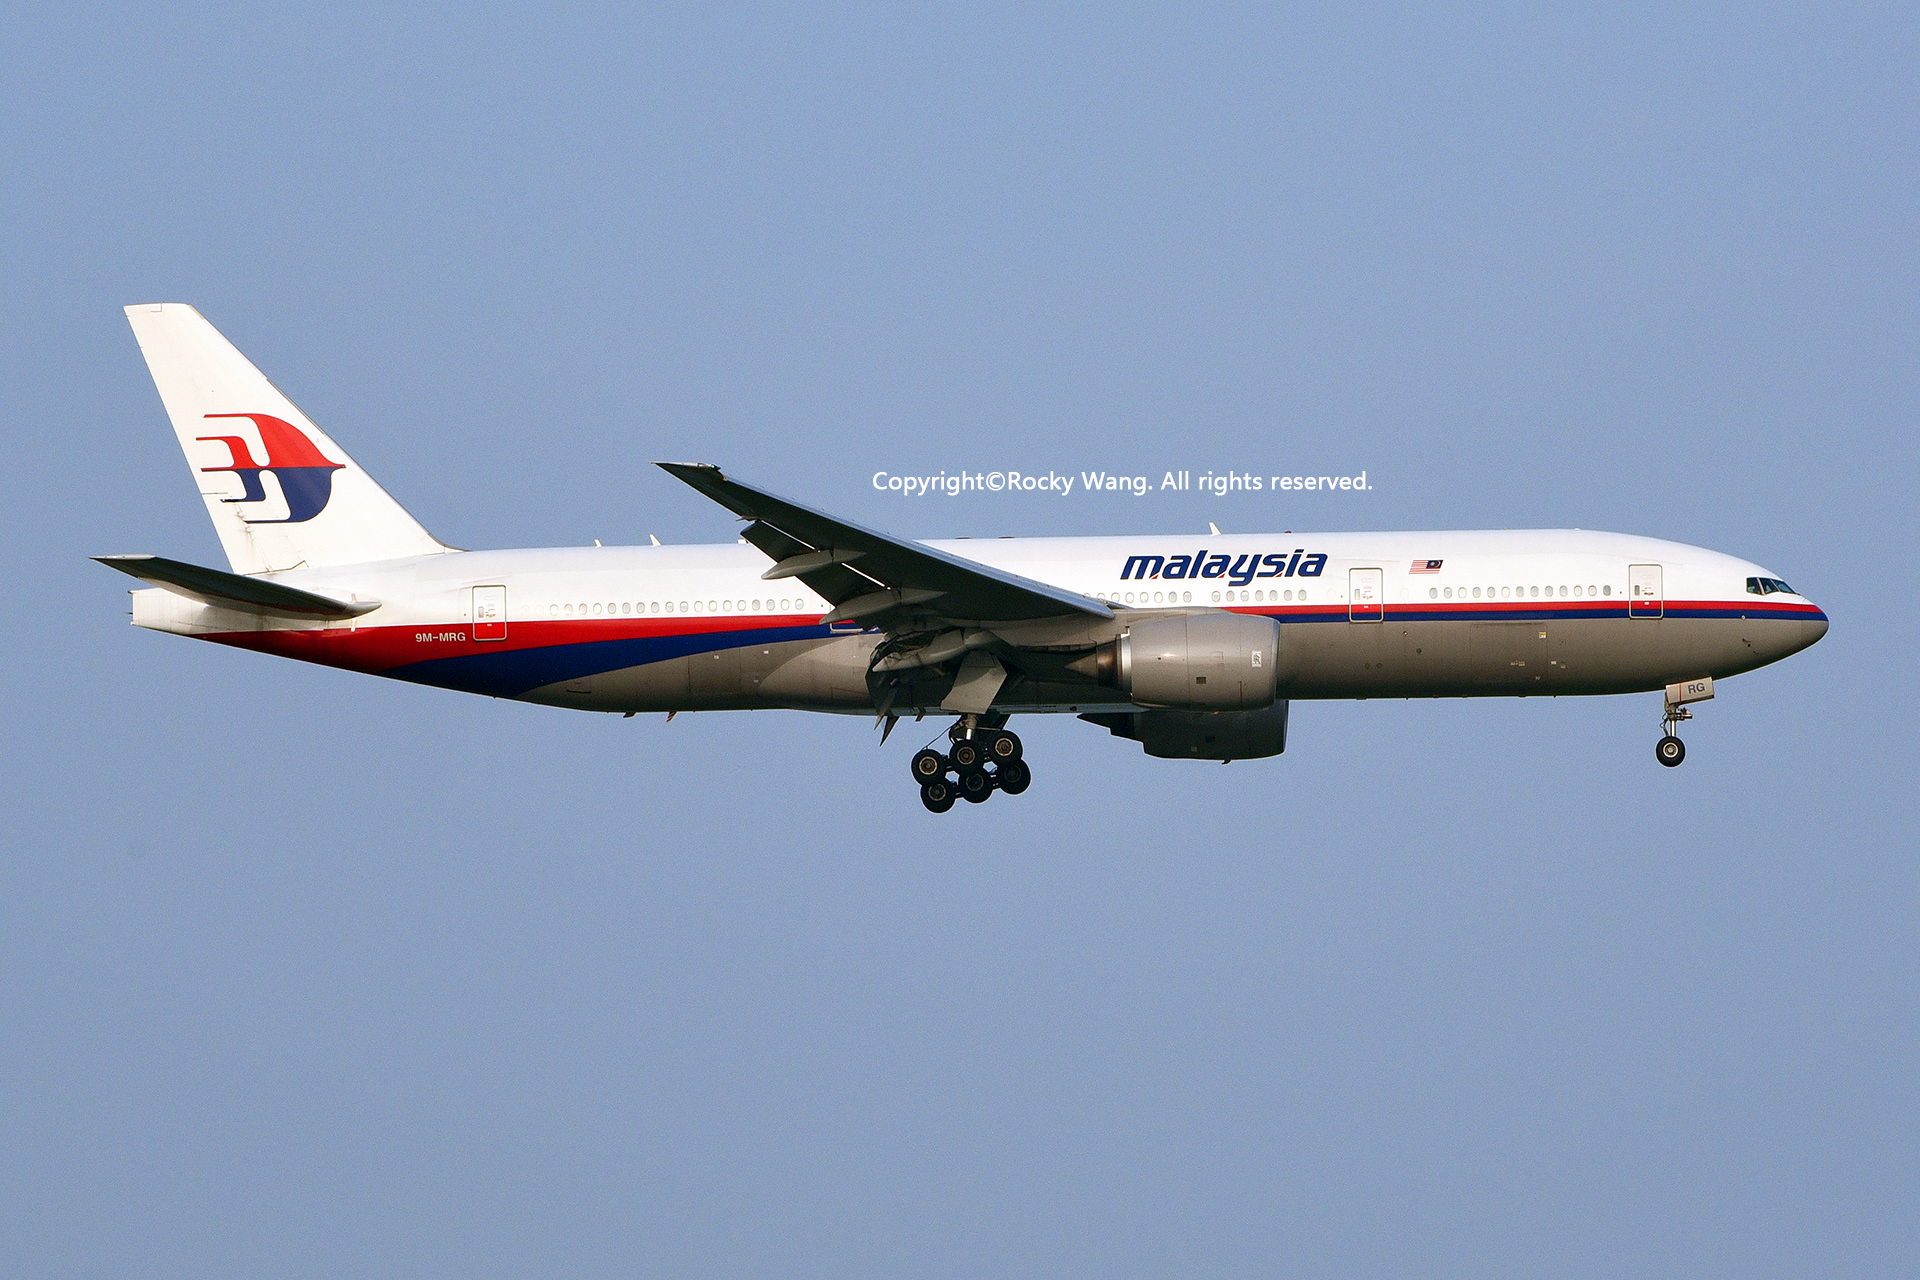 Re:[原创]居家了 批量处理老图 倾情奉献52家777 BOEING 777-2H6(ER) 9M-MRG Shanghai Pudong